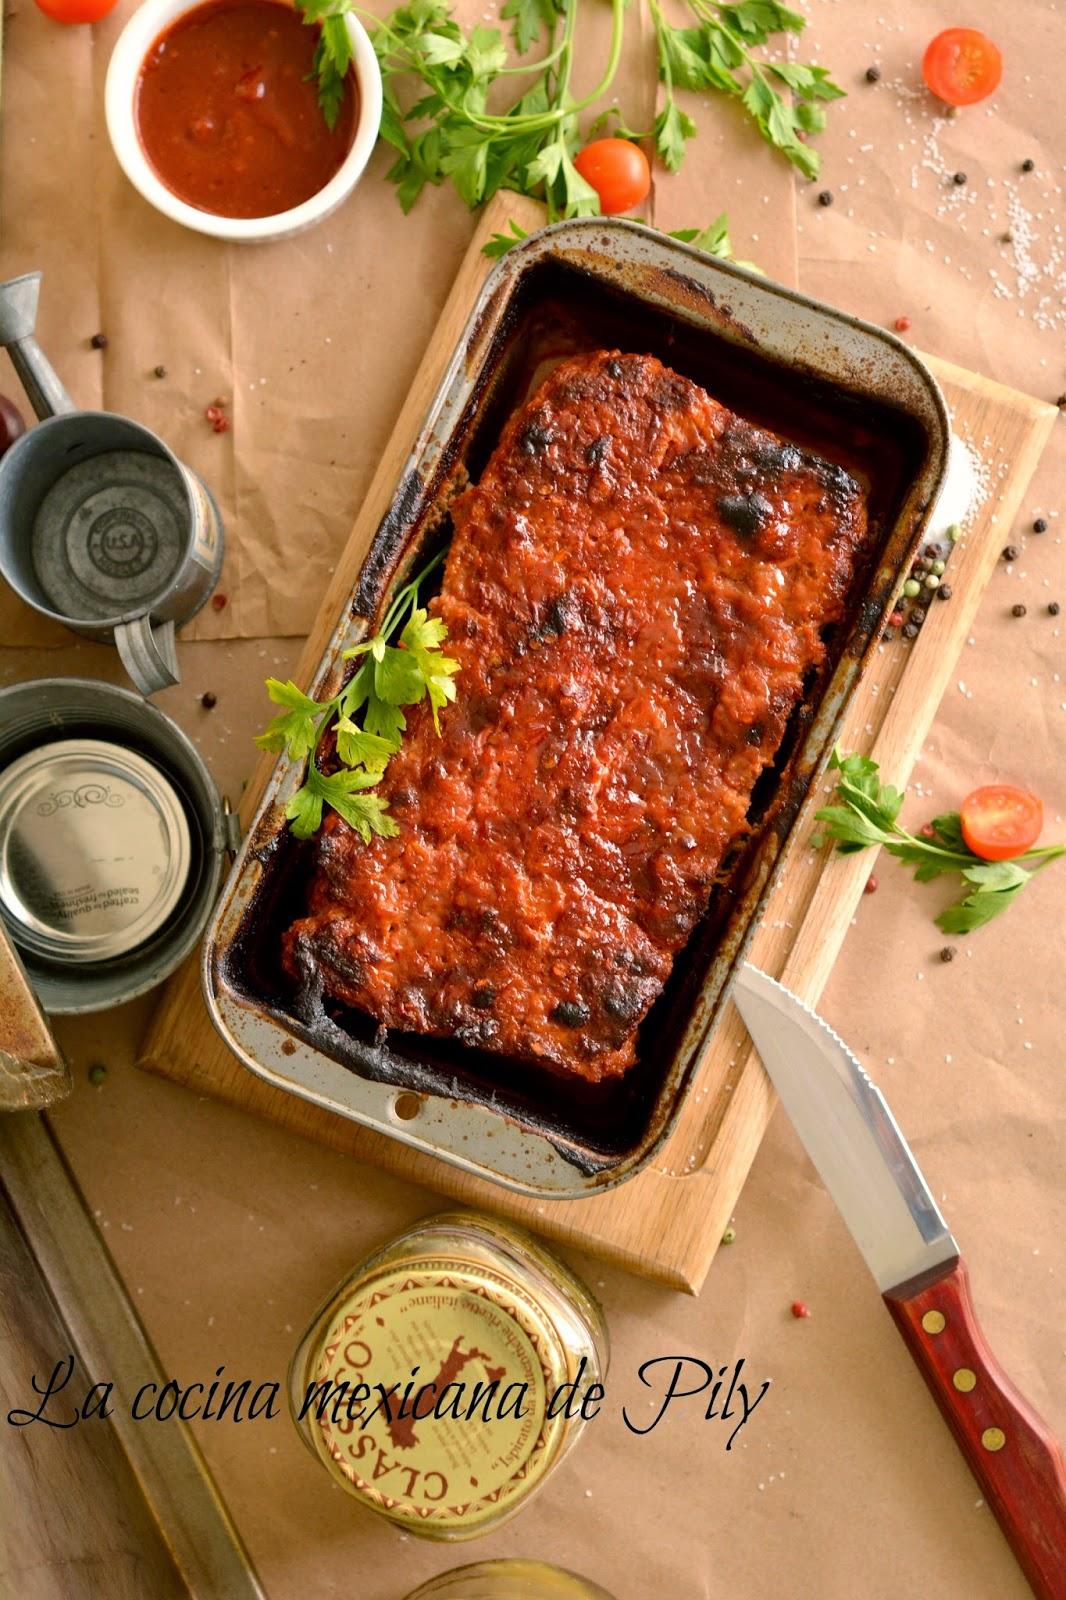 09/24/14--16:13: Pastel de Carne al Chipotle - Chipotle Meatloaf